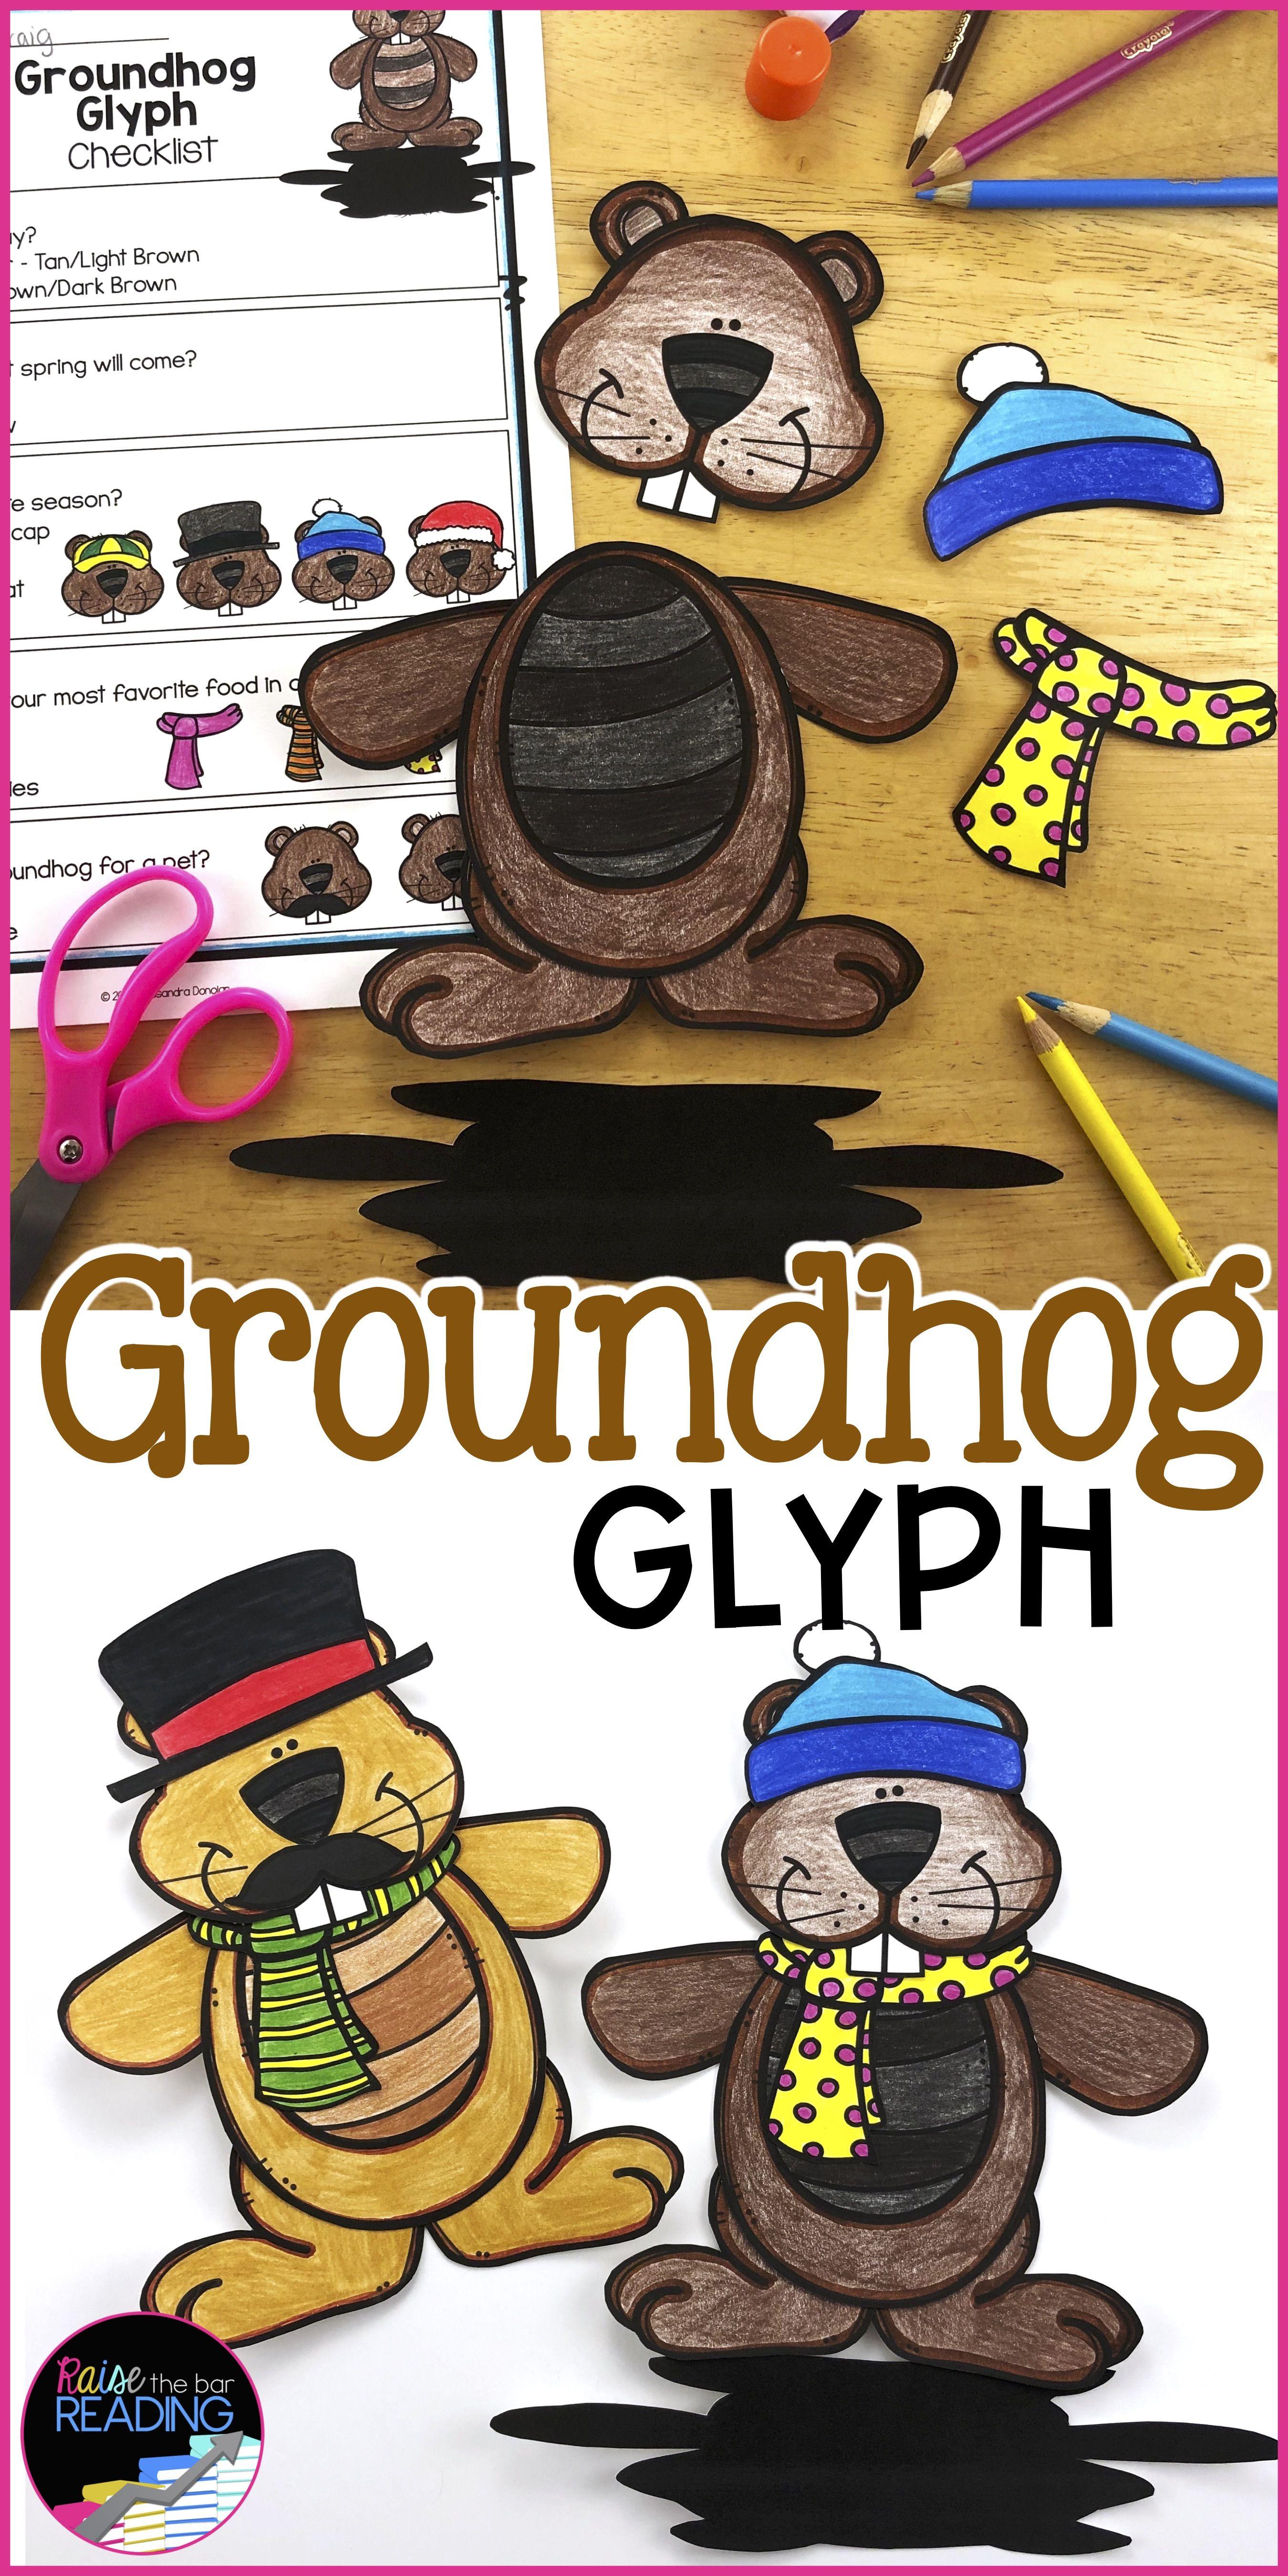 Groundhog Day Activity Groundhog Day Glyph Groundhog Day